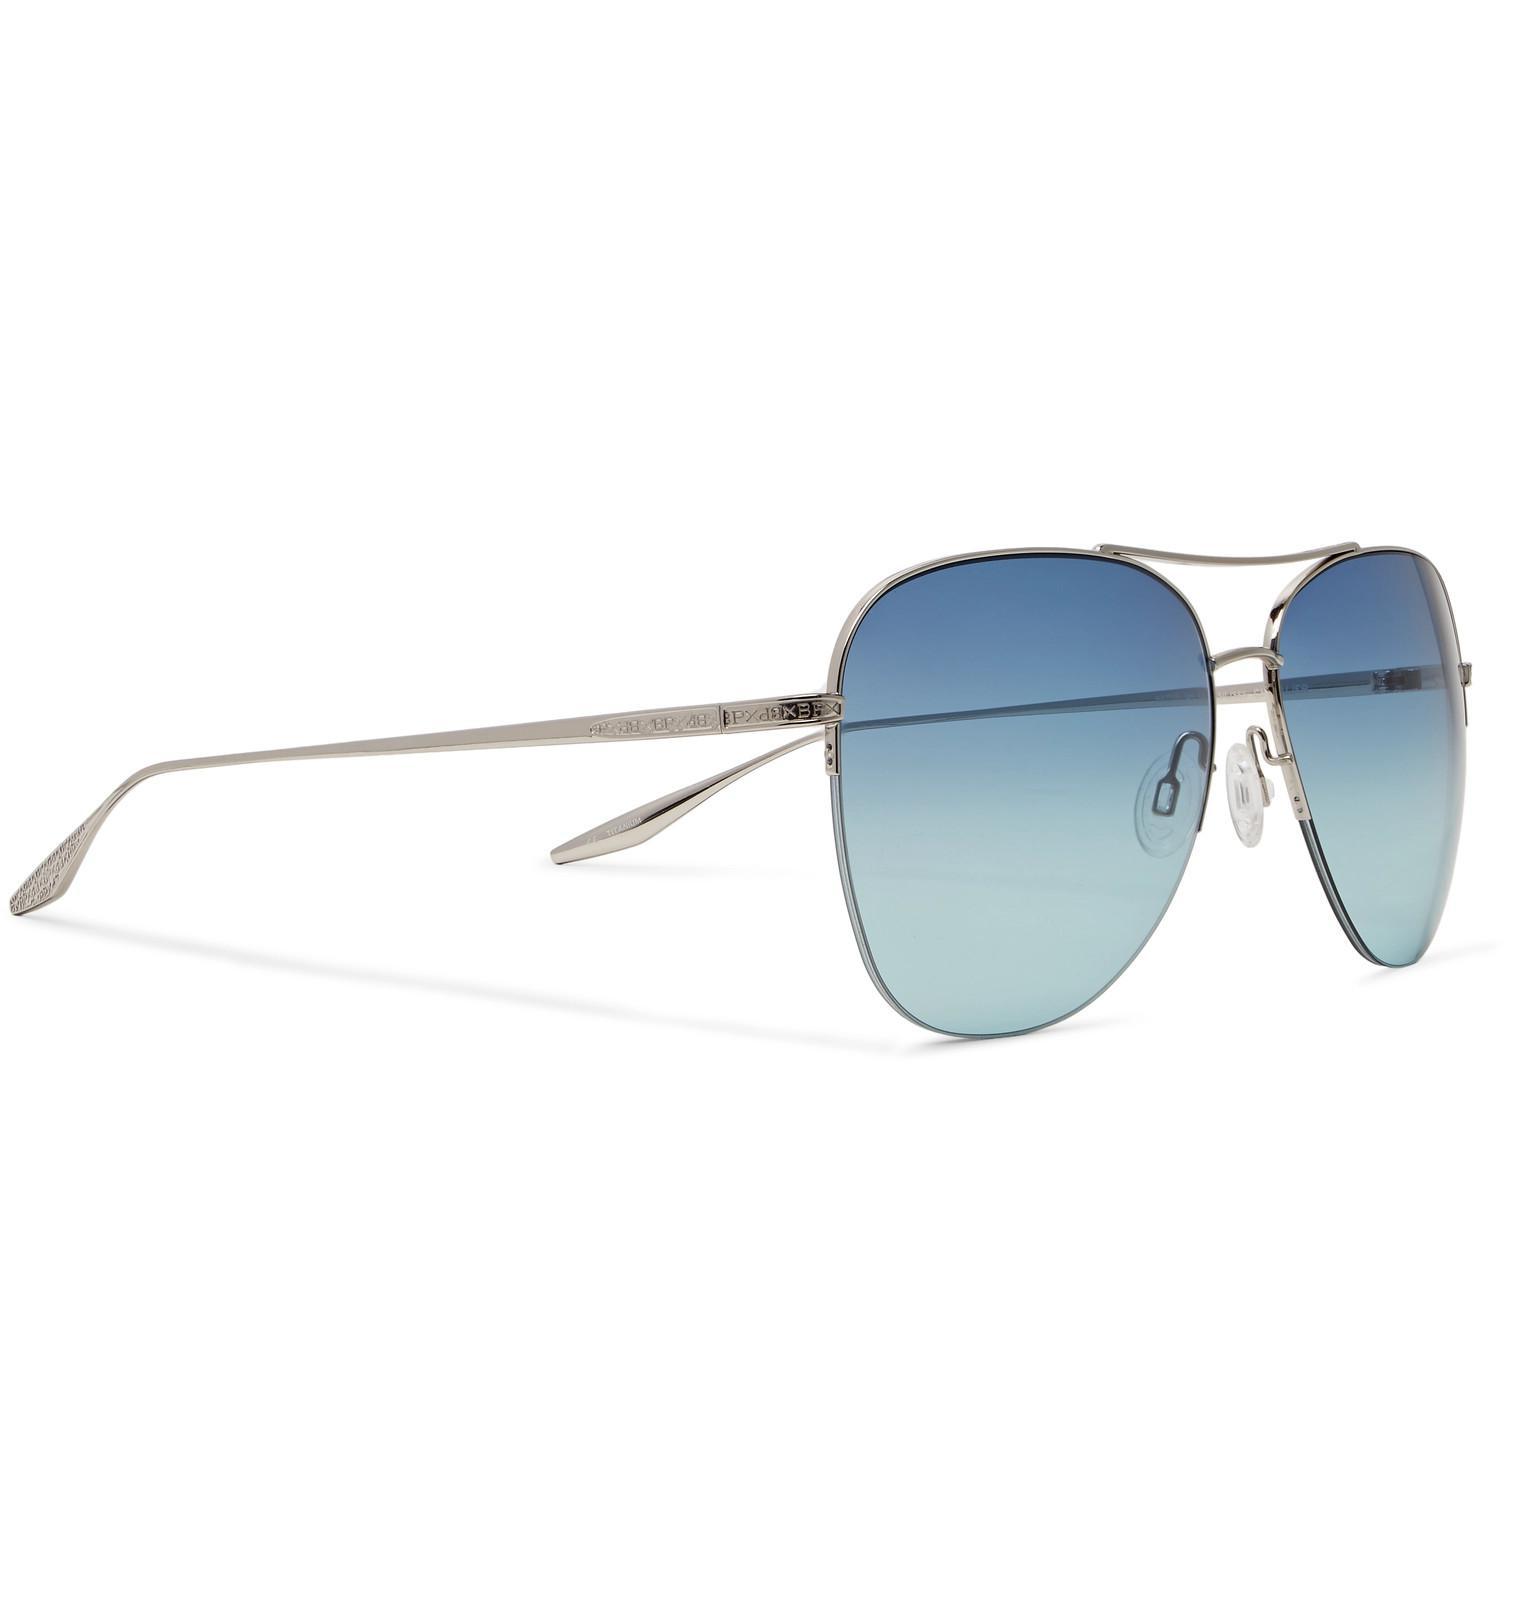 a0d4fe1f71 Barton Perreira Chevalier Aviator-style Silver-tone Titanium ...